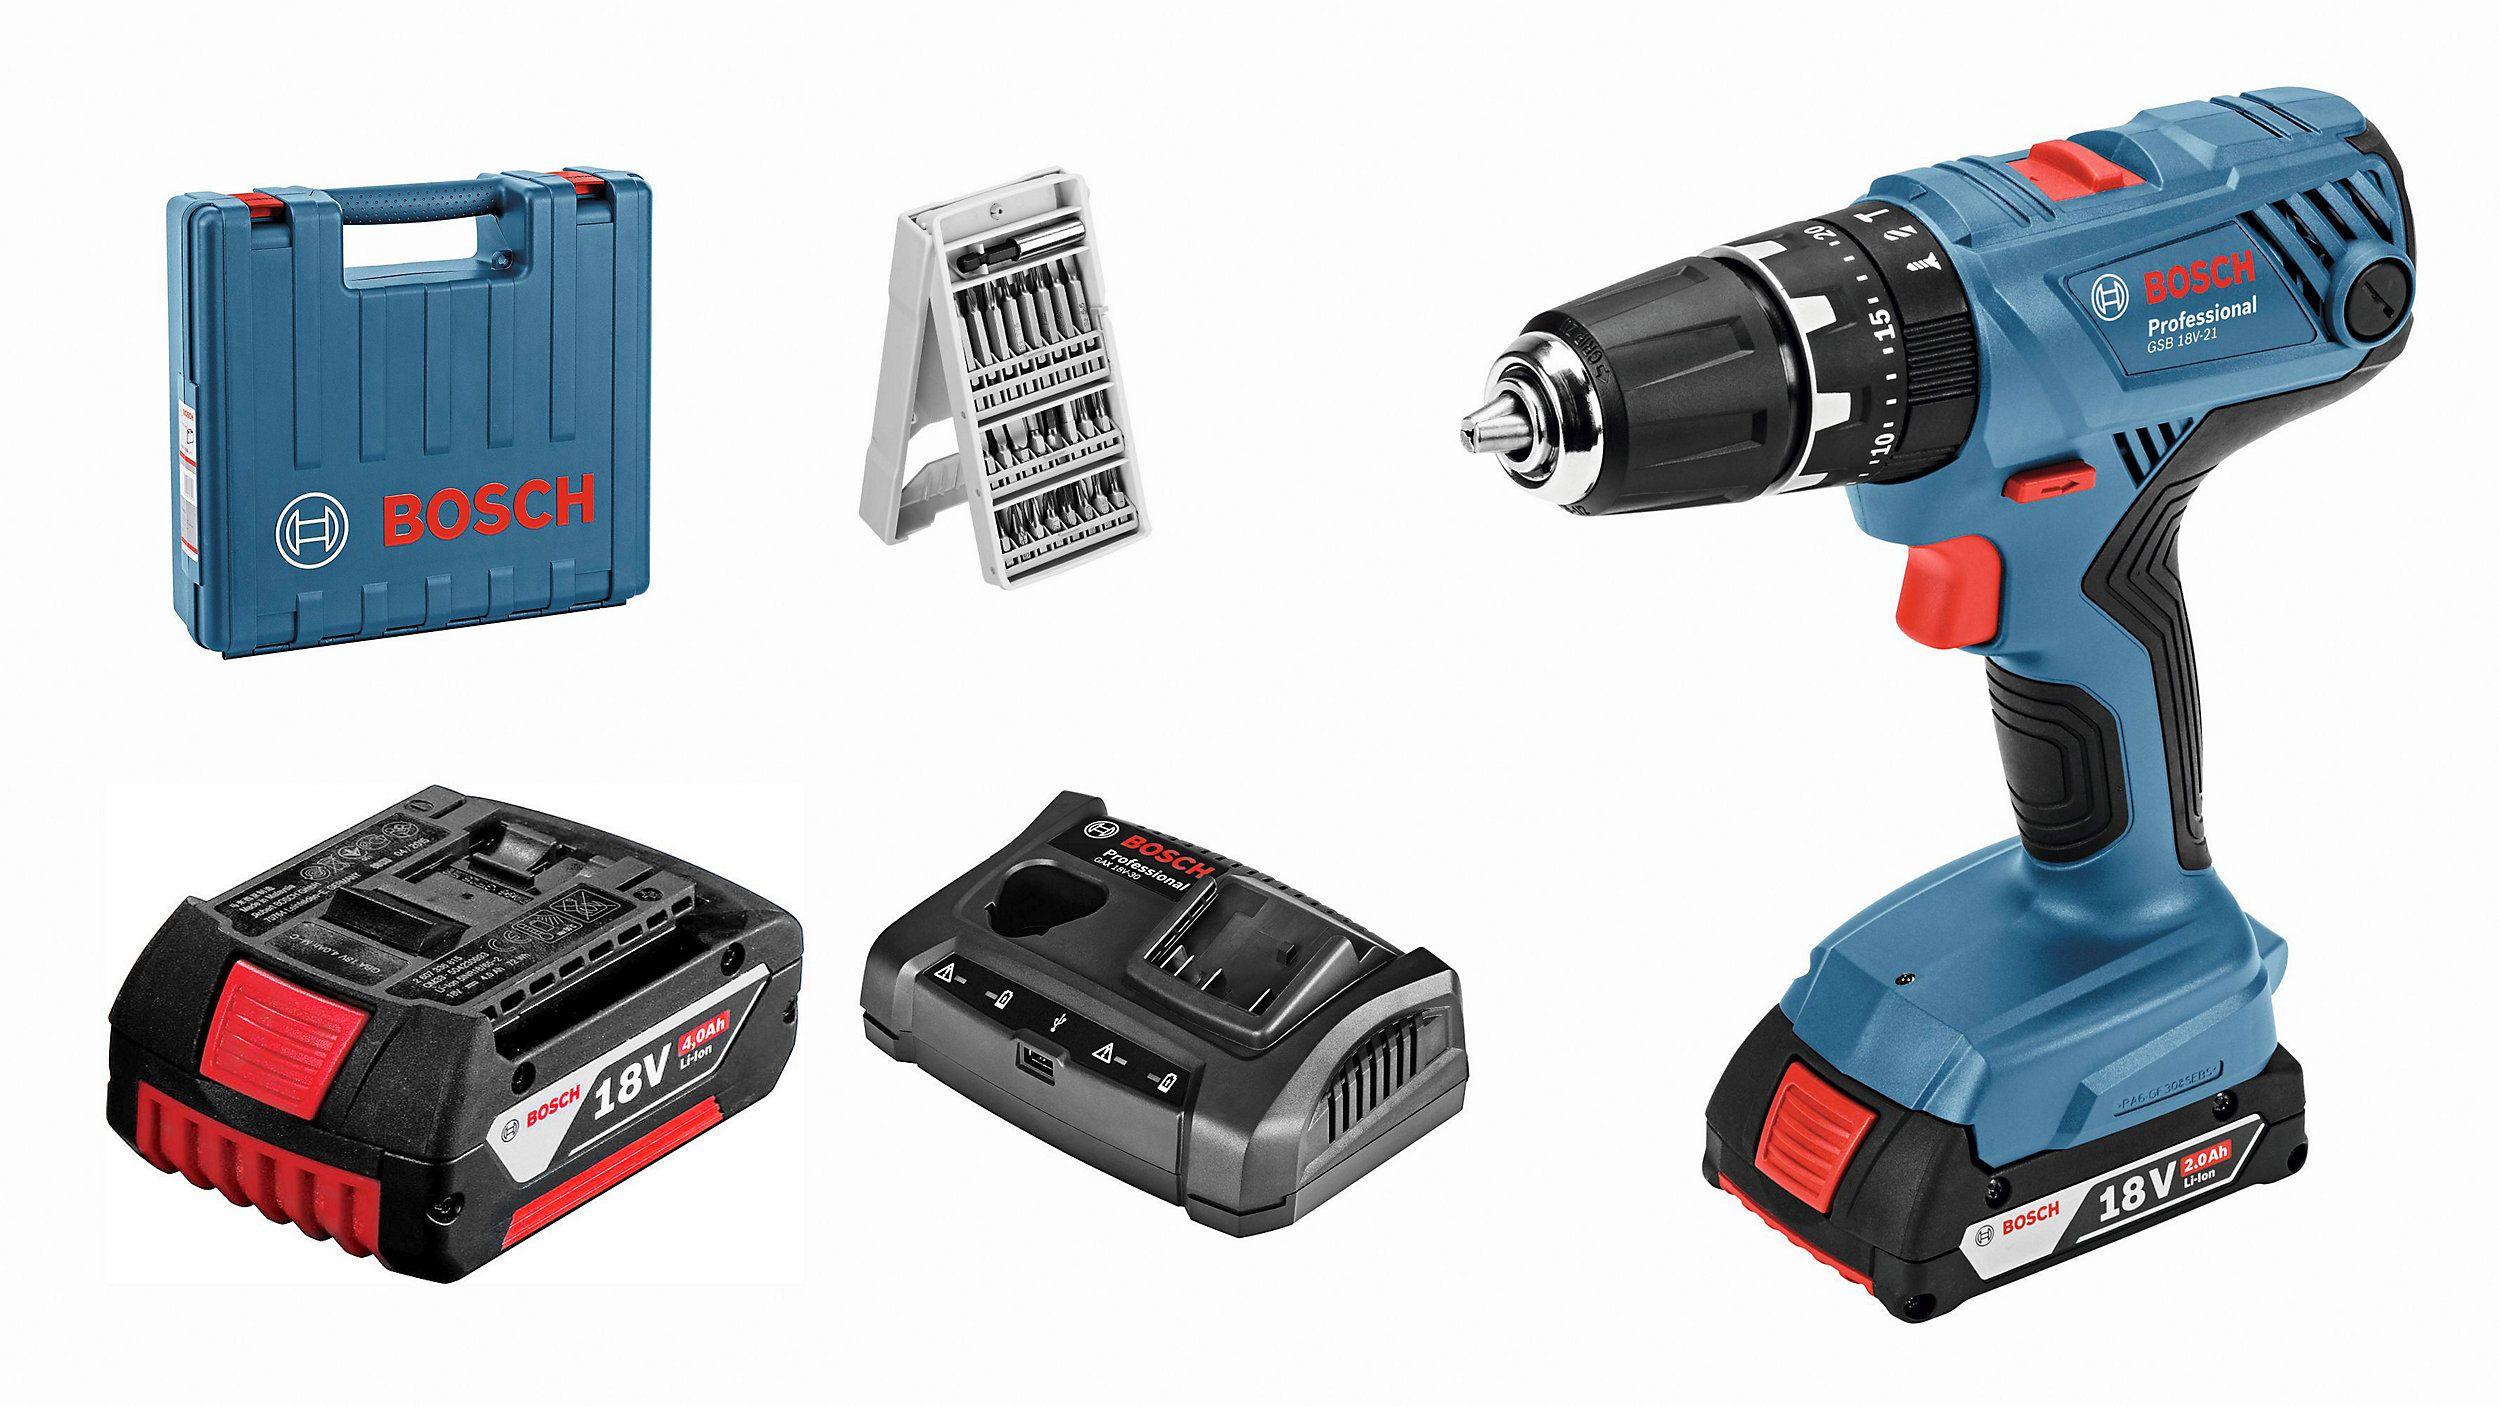 Perceuse-visseuse Bosch GSB 18V + 2 batteries 18V 2Ah & 4Ah + chargeur double + Box + Embouts